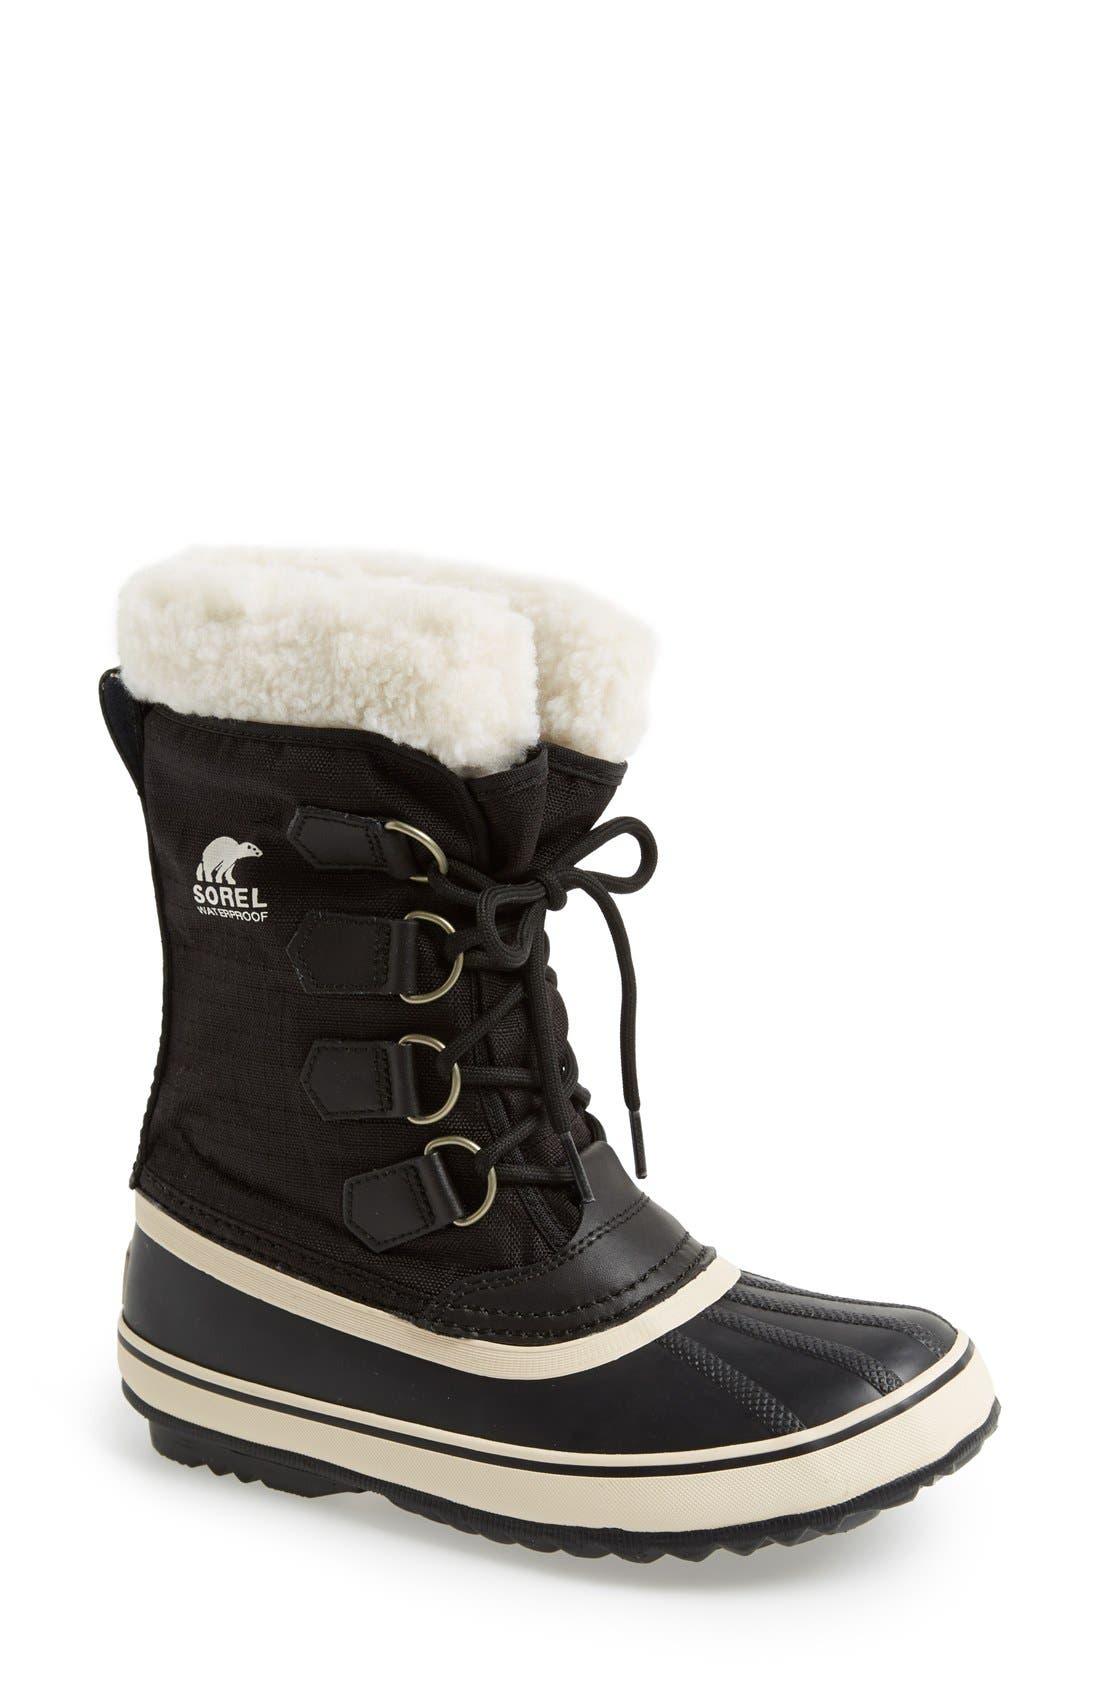 Main Image - SOREL 'Winter Carnival' Boot (Women)